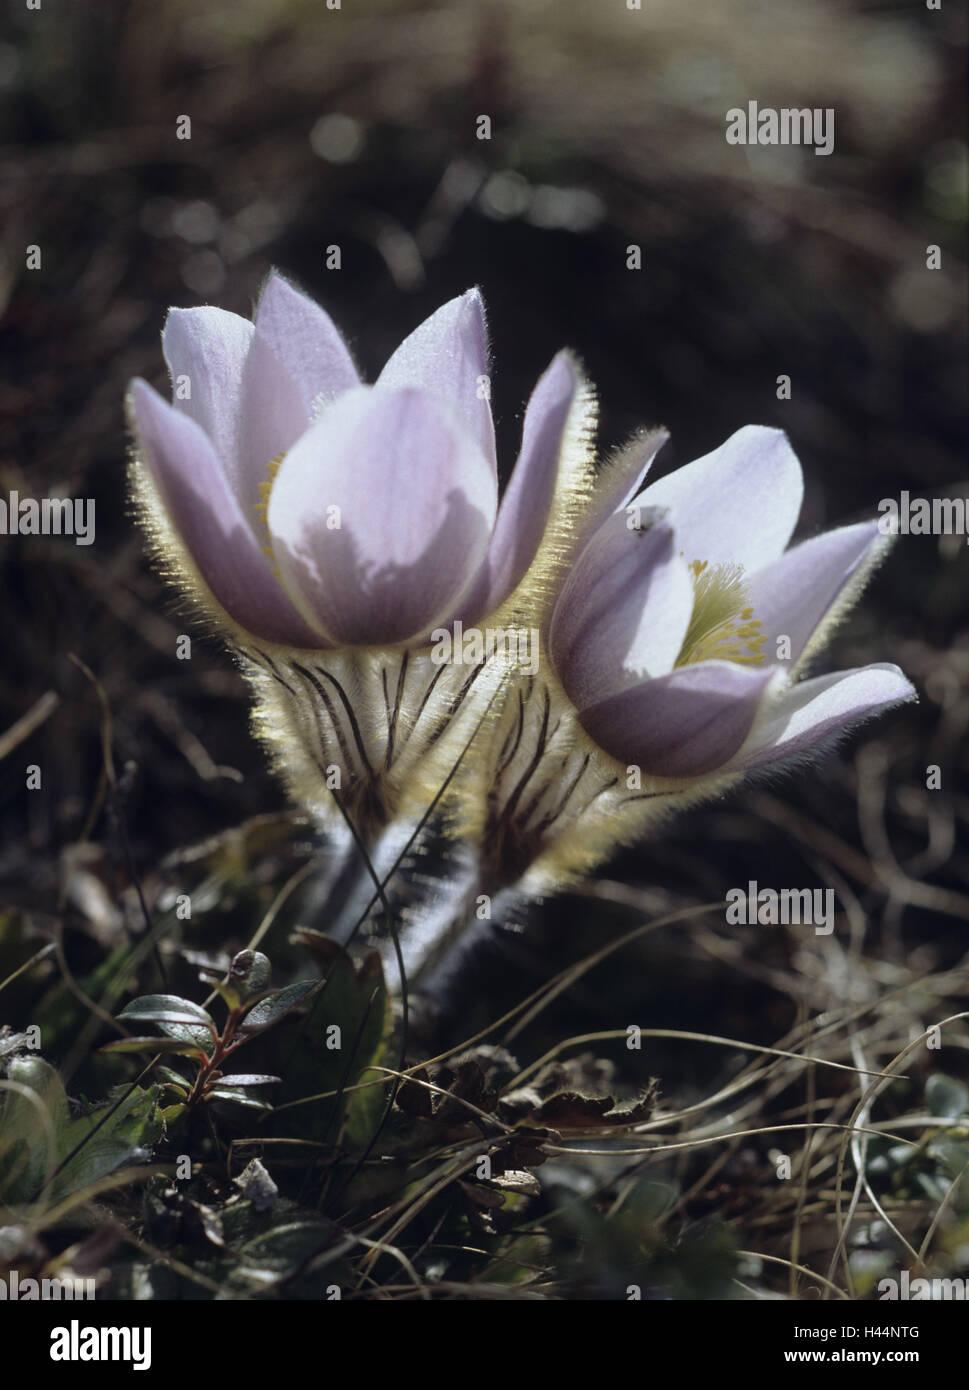 Culinary clamp, Pulsatilla spec., blossoms, two, - Stock Image